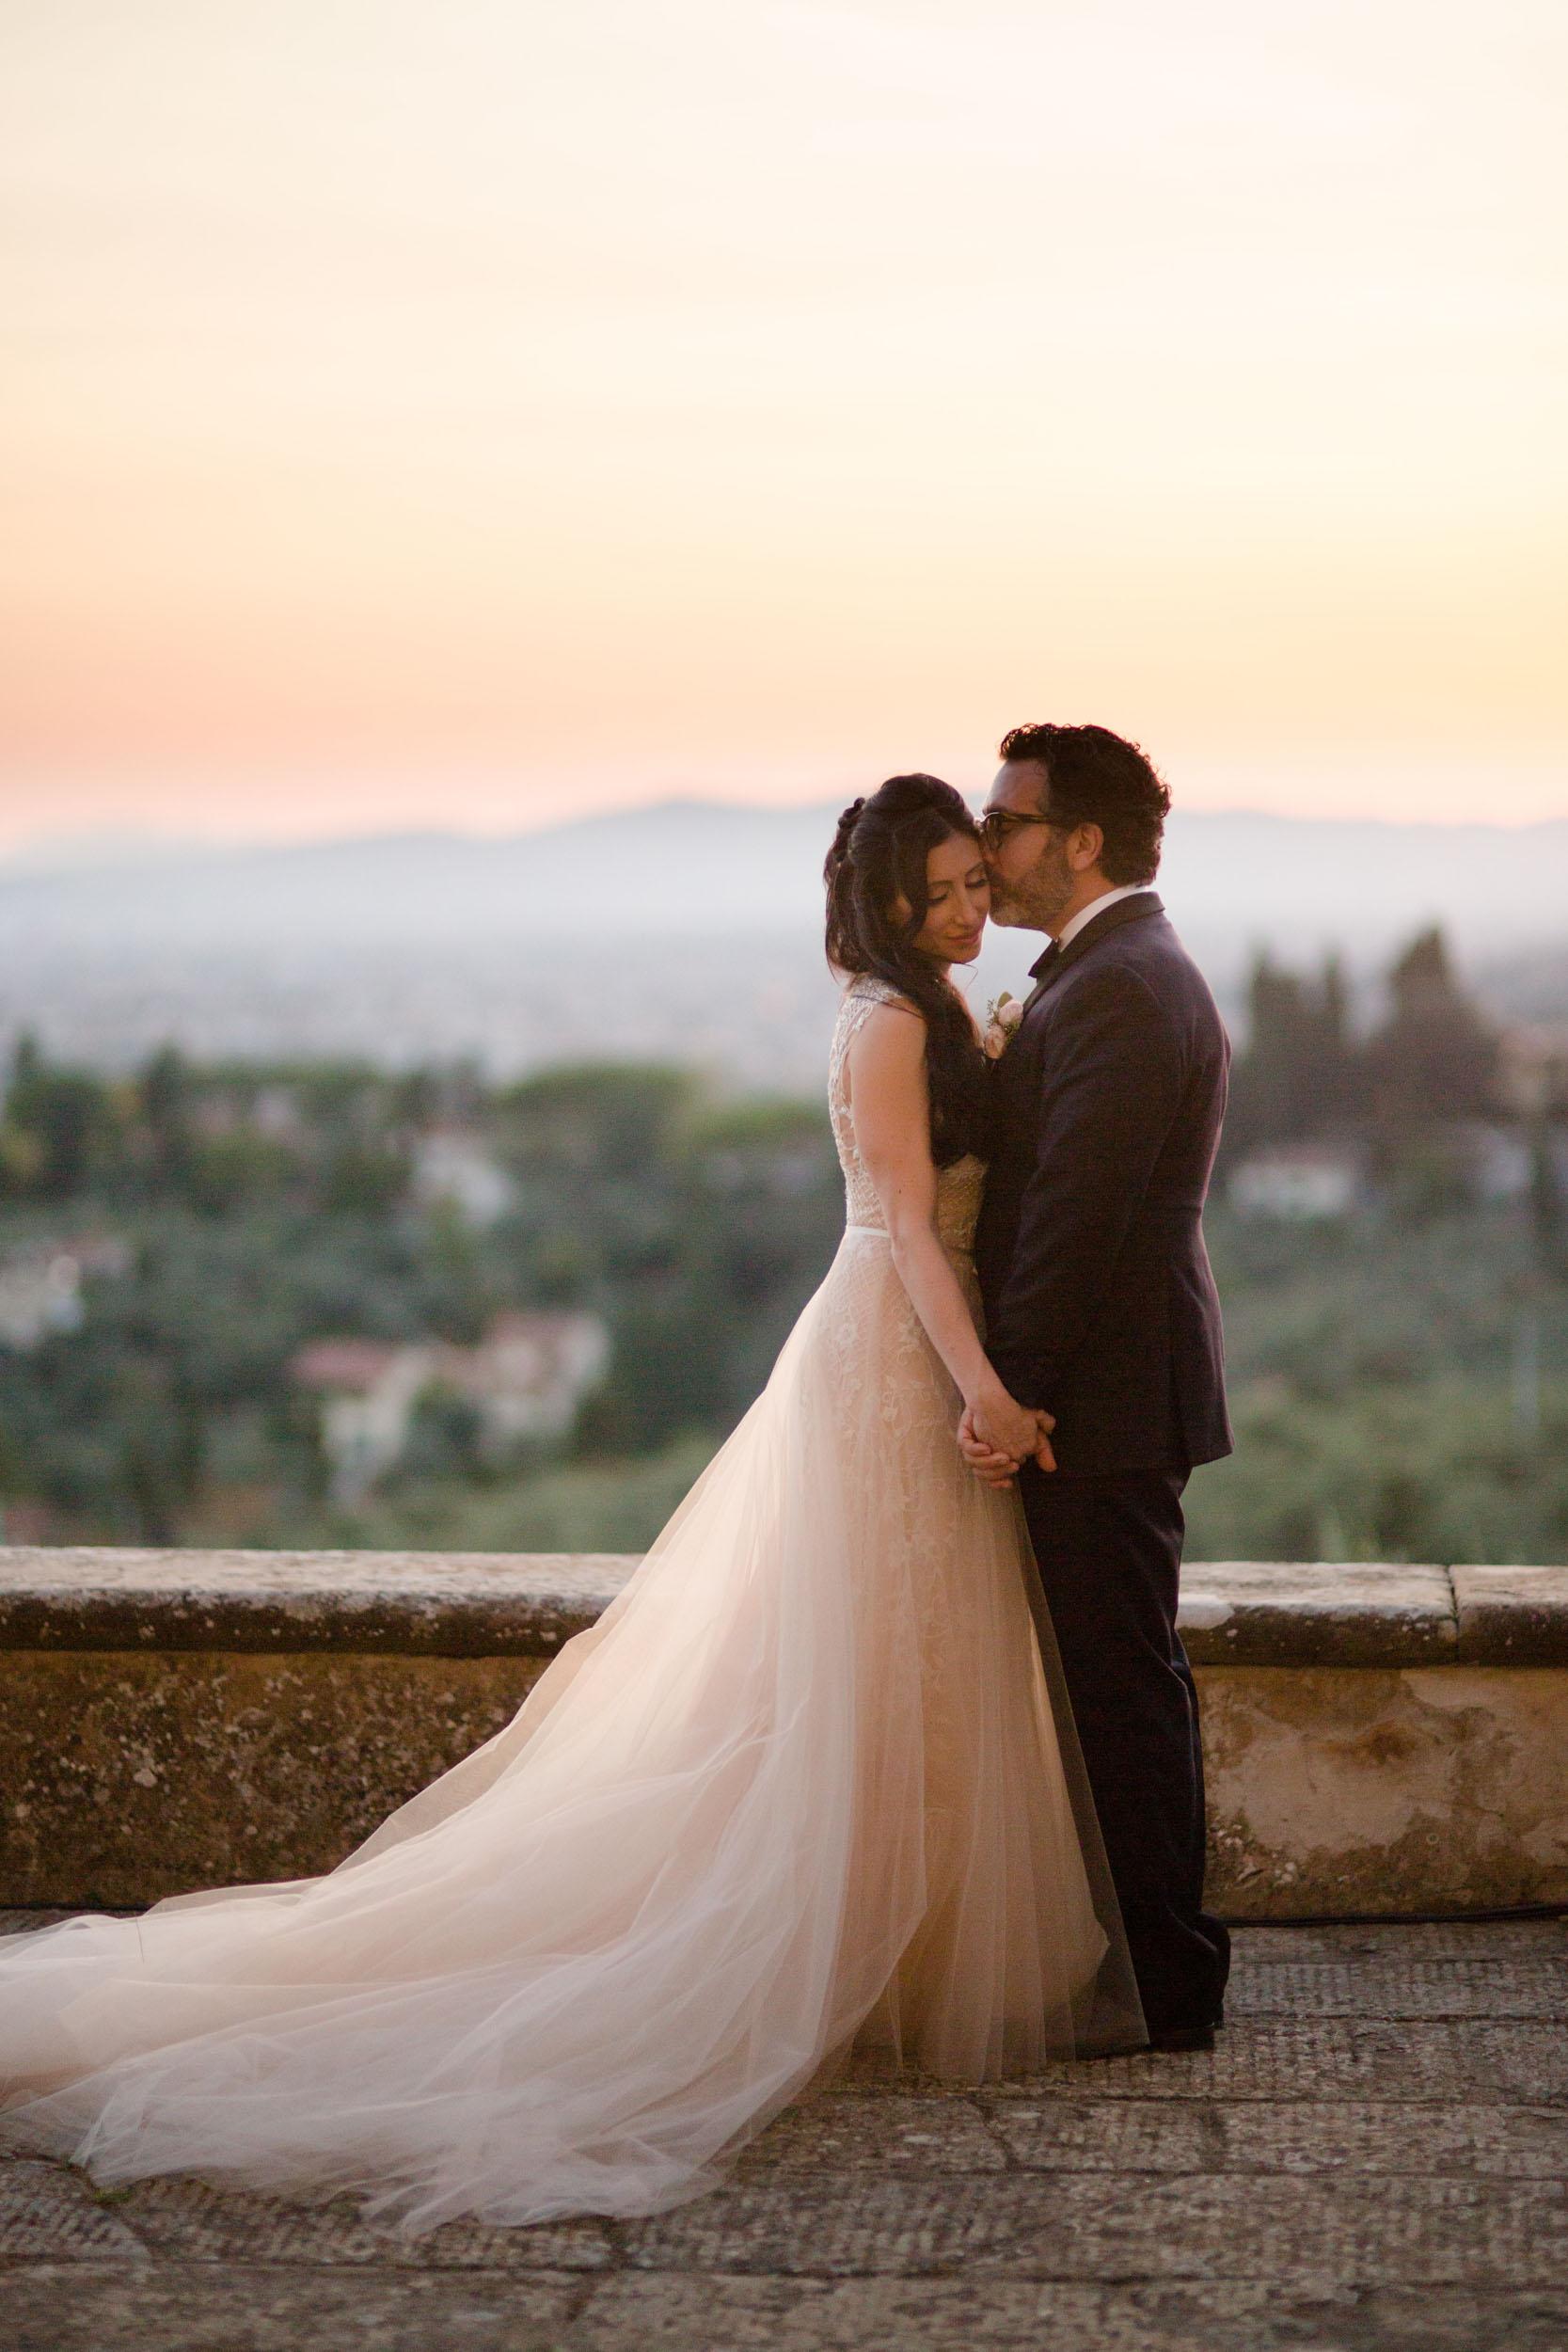 villa-gamberaia-florence-italy-destination-wedding-68.jpg